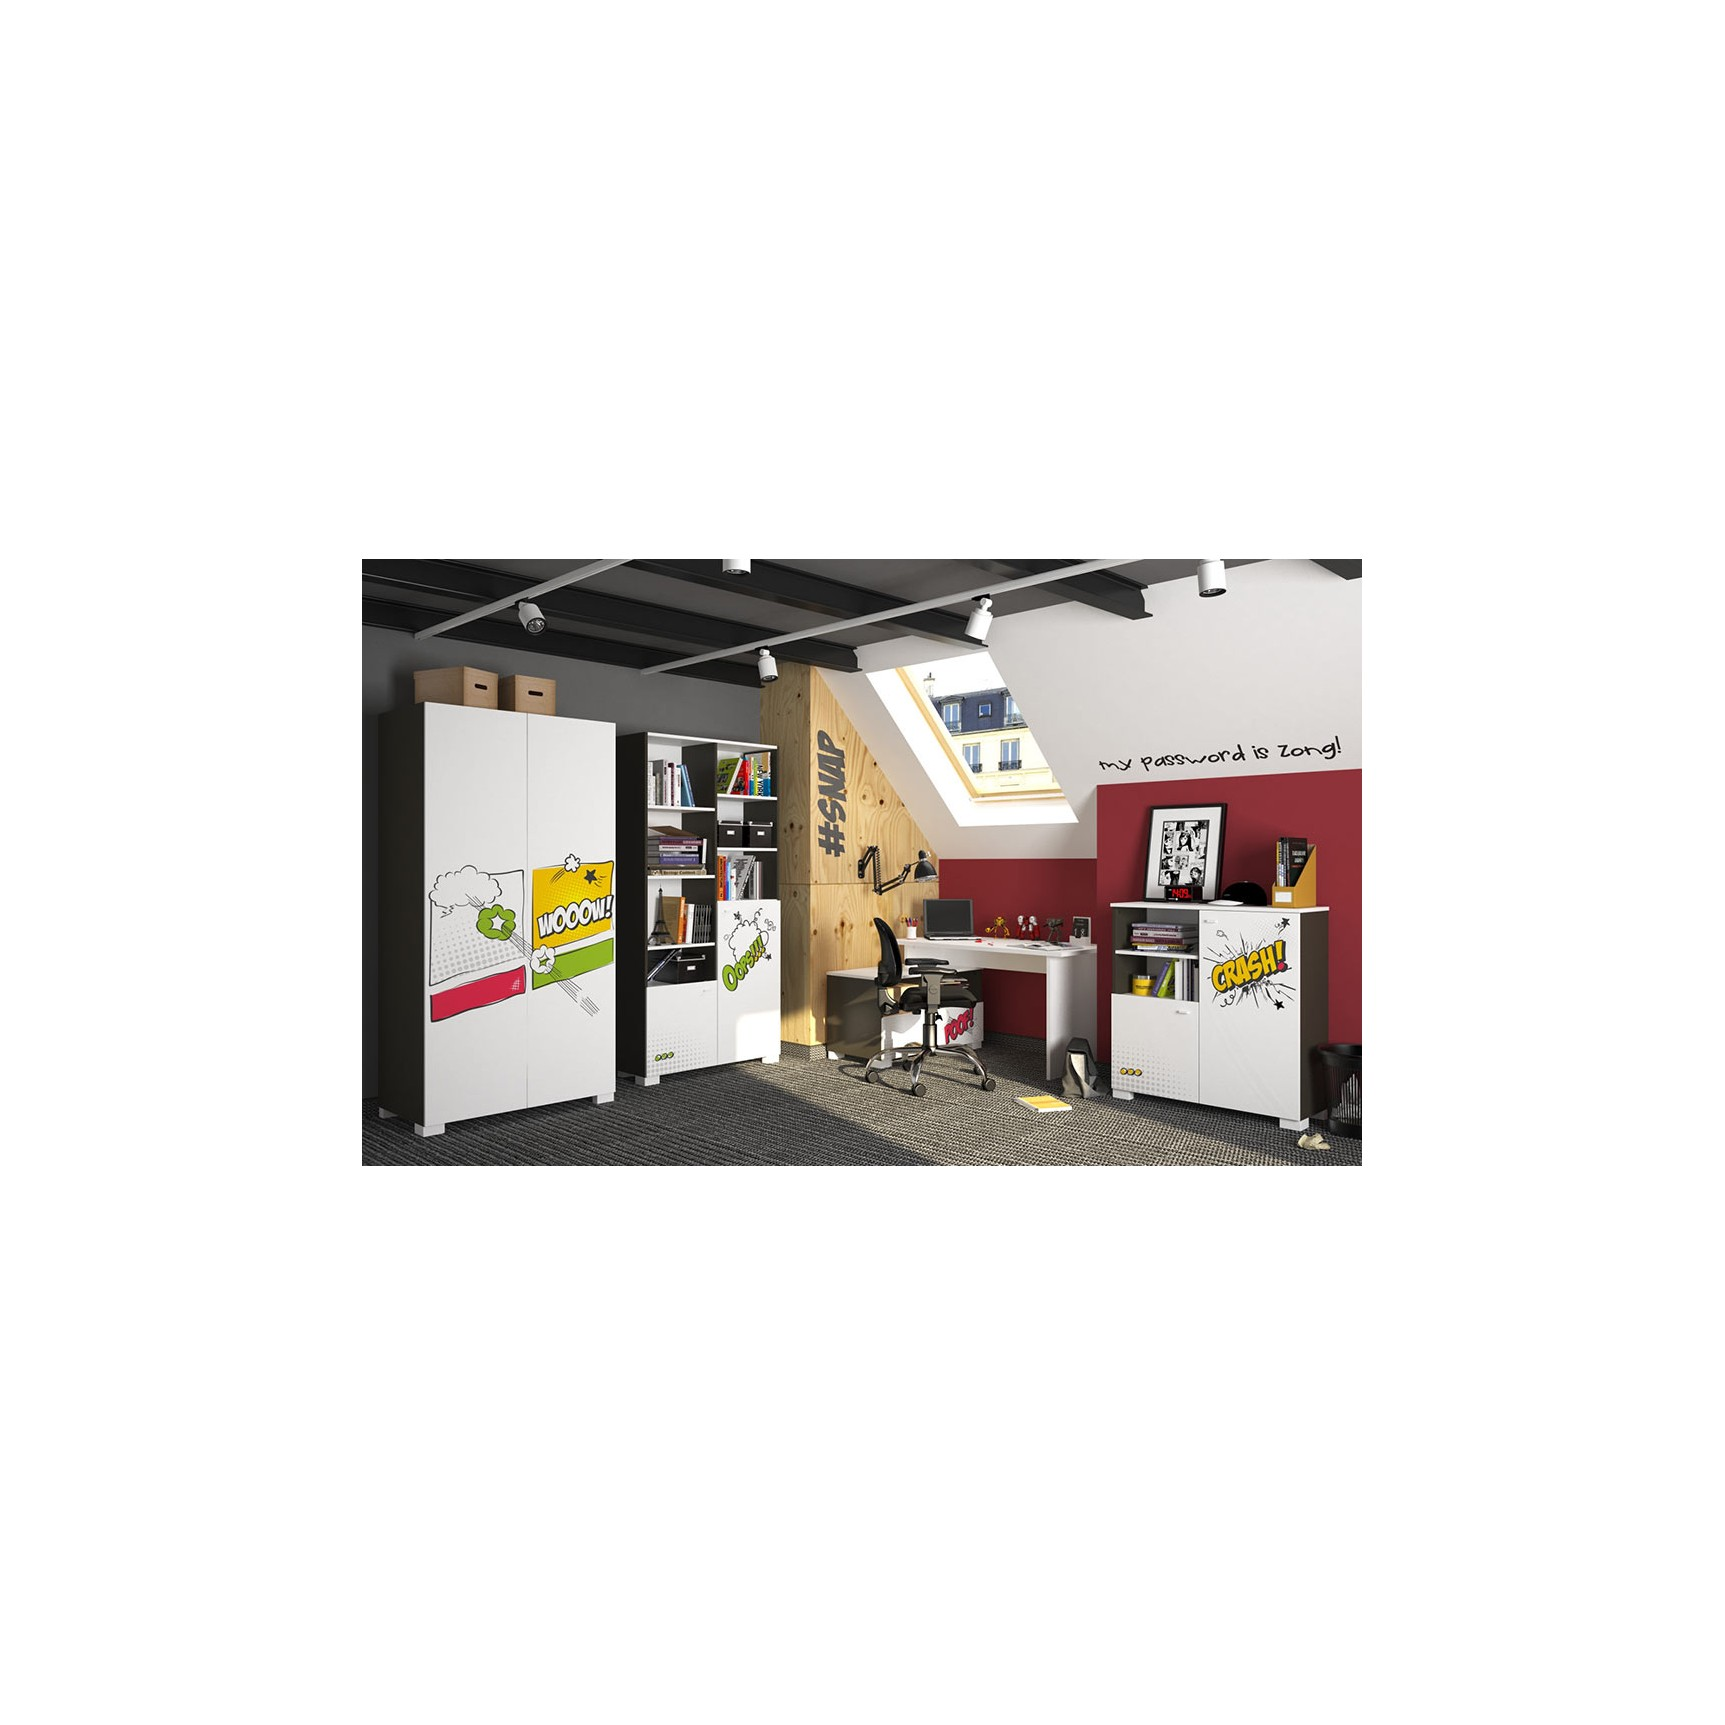 Meuble Tv Achat Meuble Tv Design Azura Home Maroc # Meuble Tv Armoire